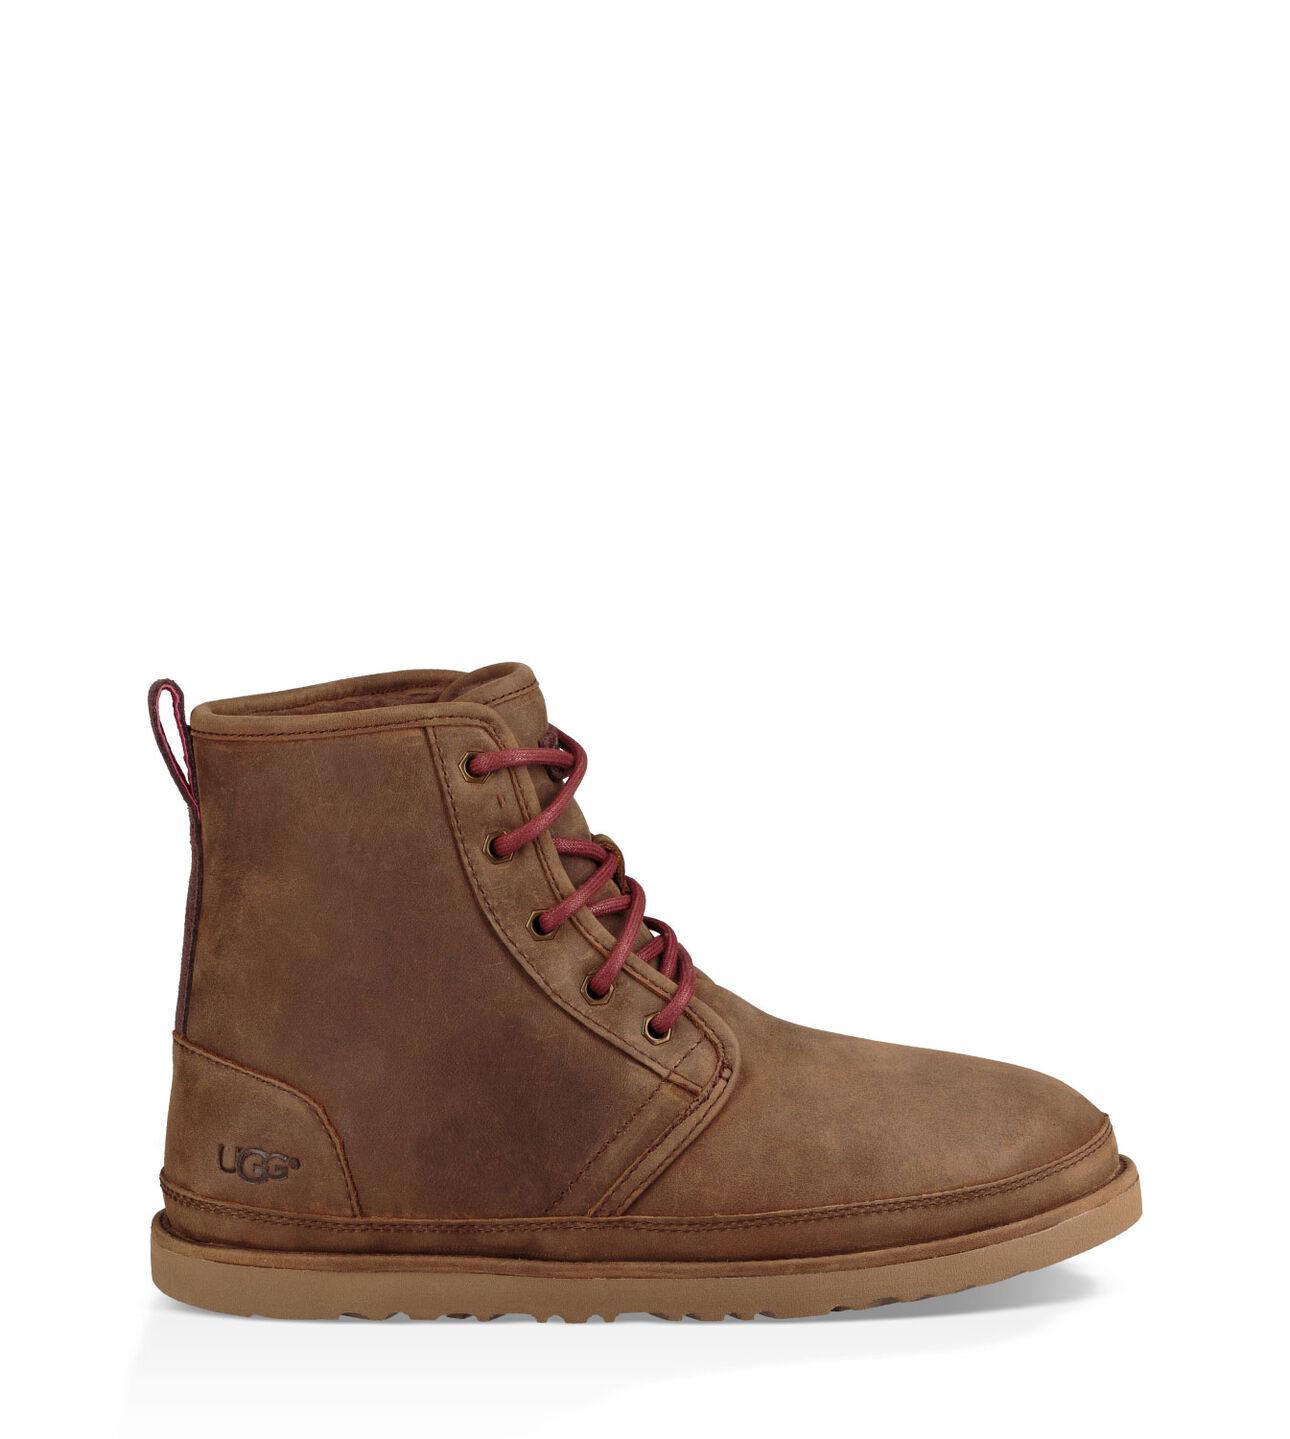 a0b18f8846a Harkley Waterproof Boot